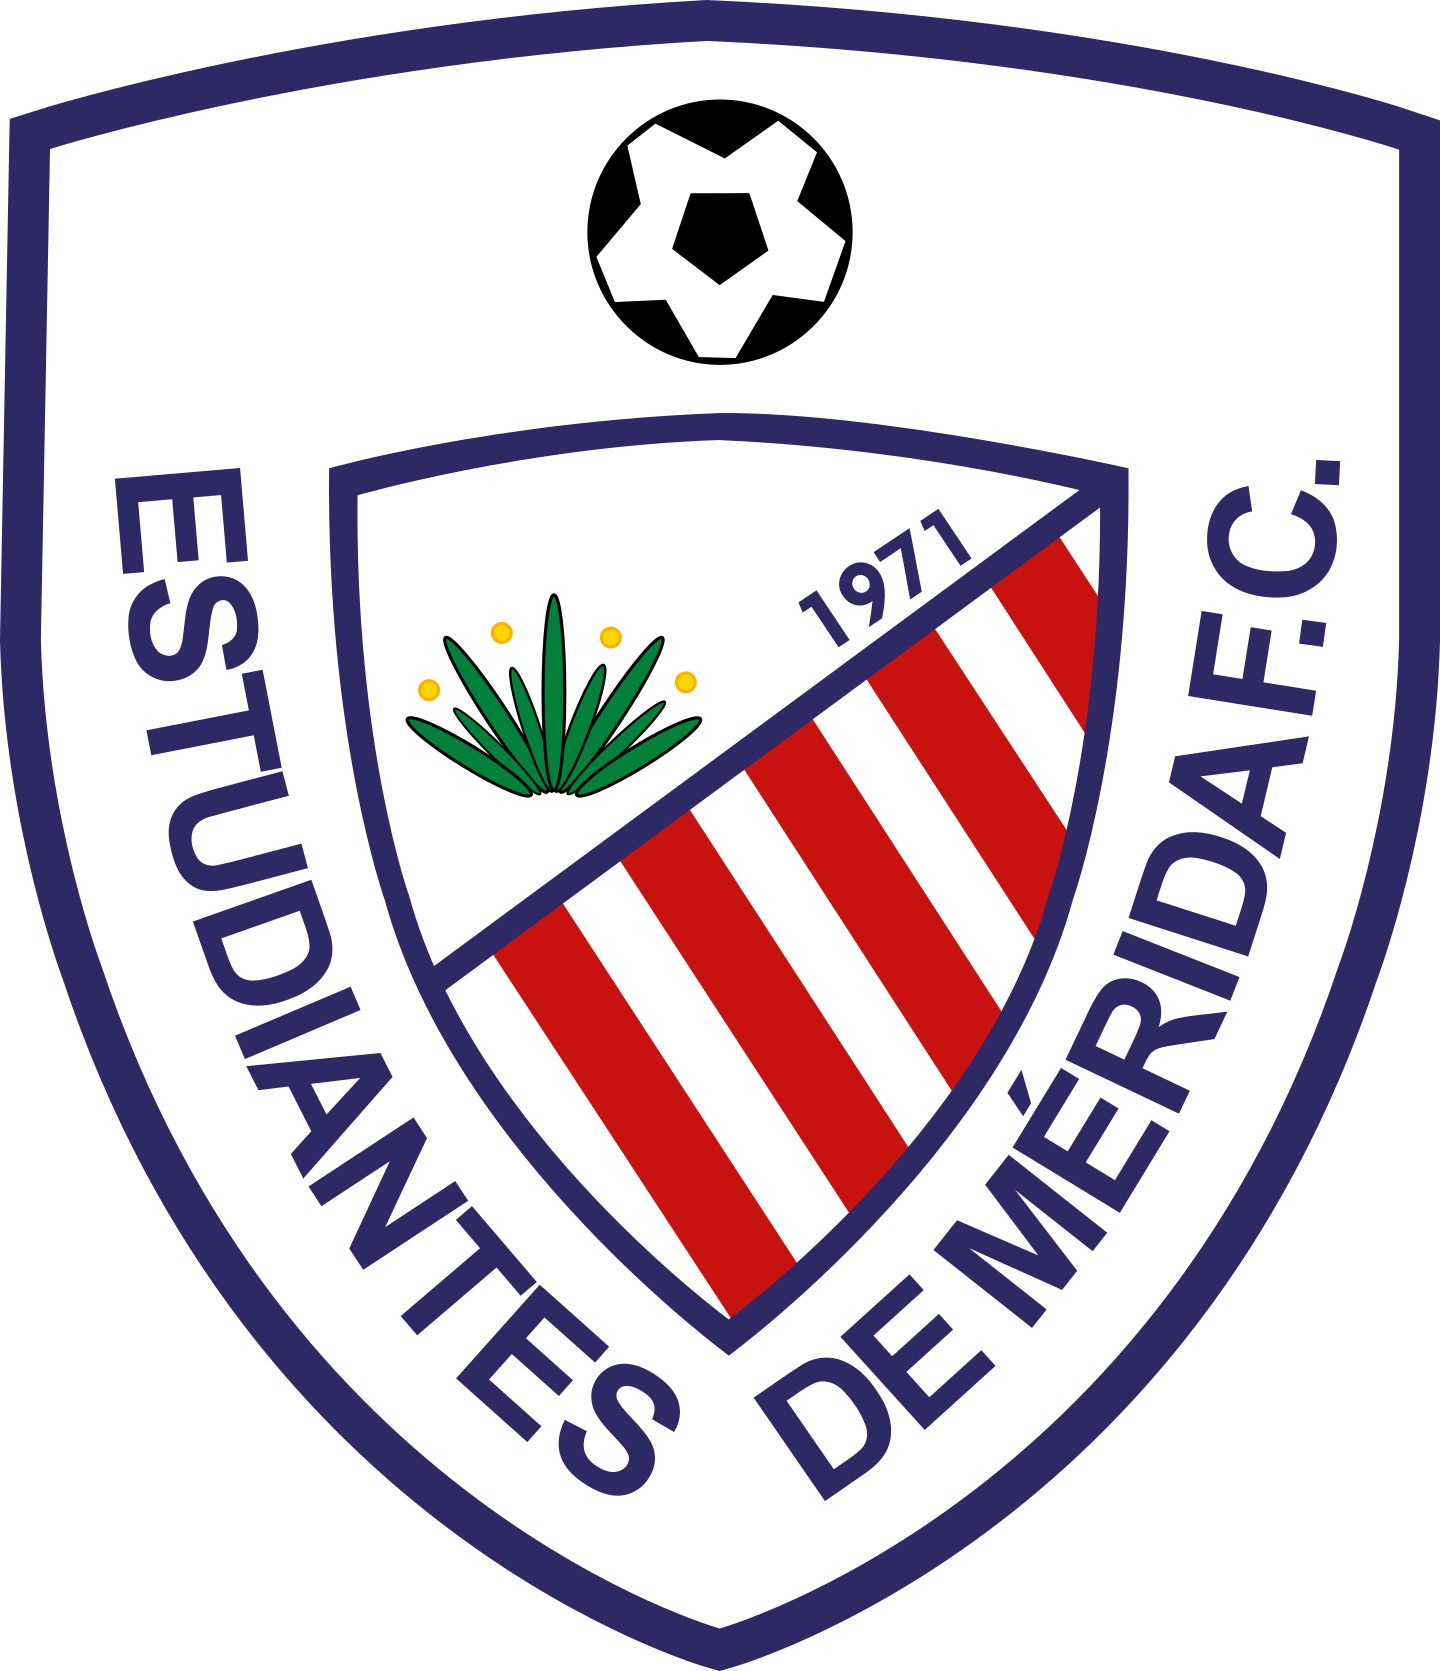 estudiantes de merida logo 2 - Estudiantes de Mérida Logo